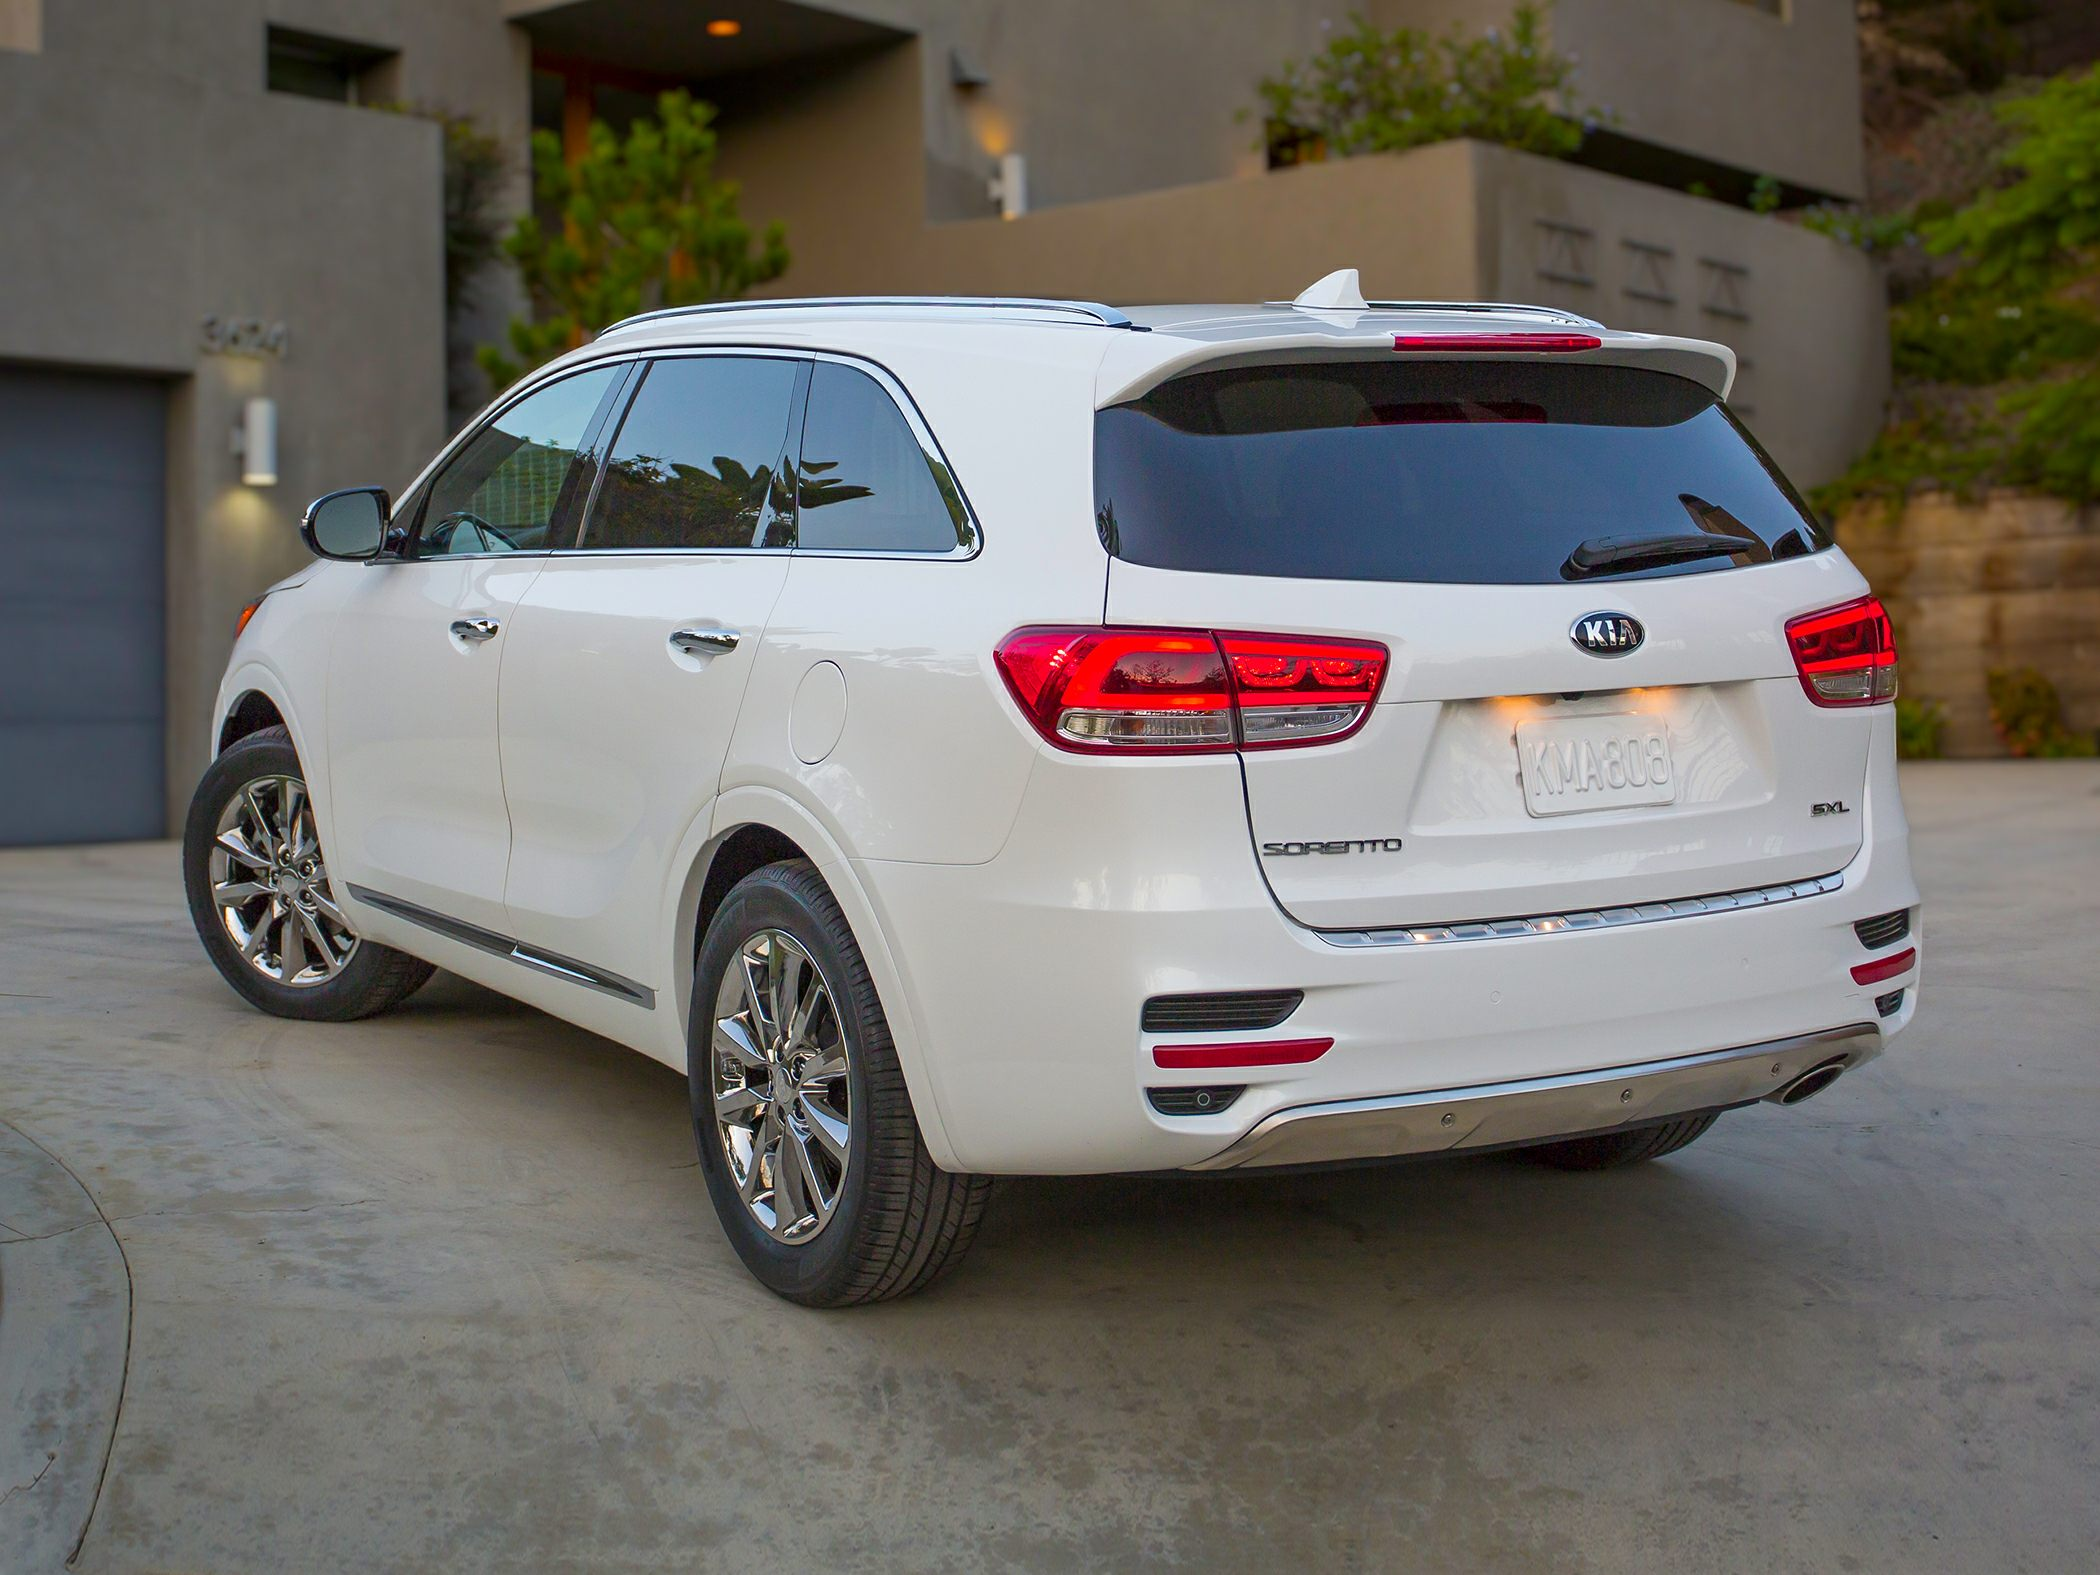 incentives finance used rebates tulsa kia lease vehicles sorento and new specials